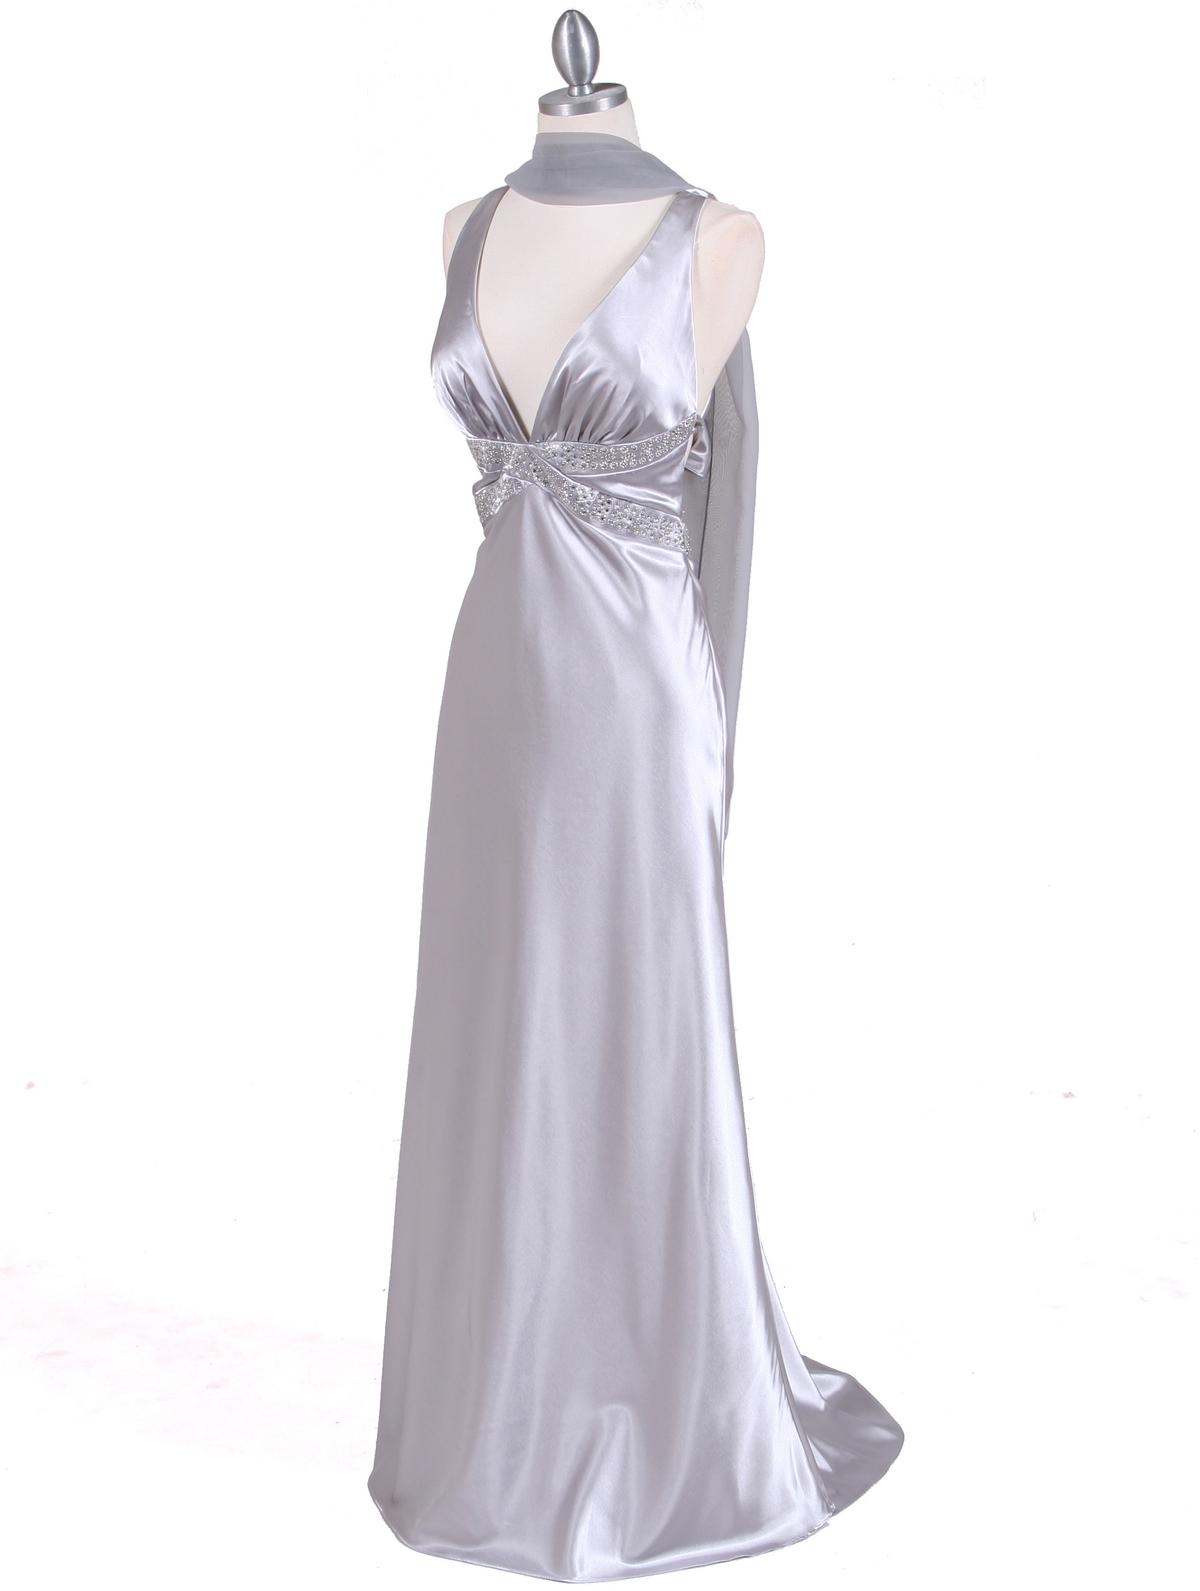 Silver Satin Evening Dress Sung Boutique L A